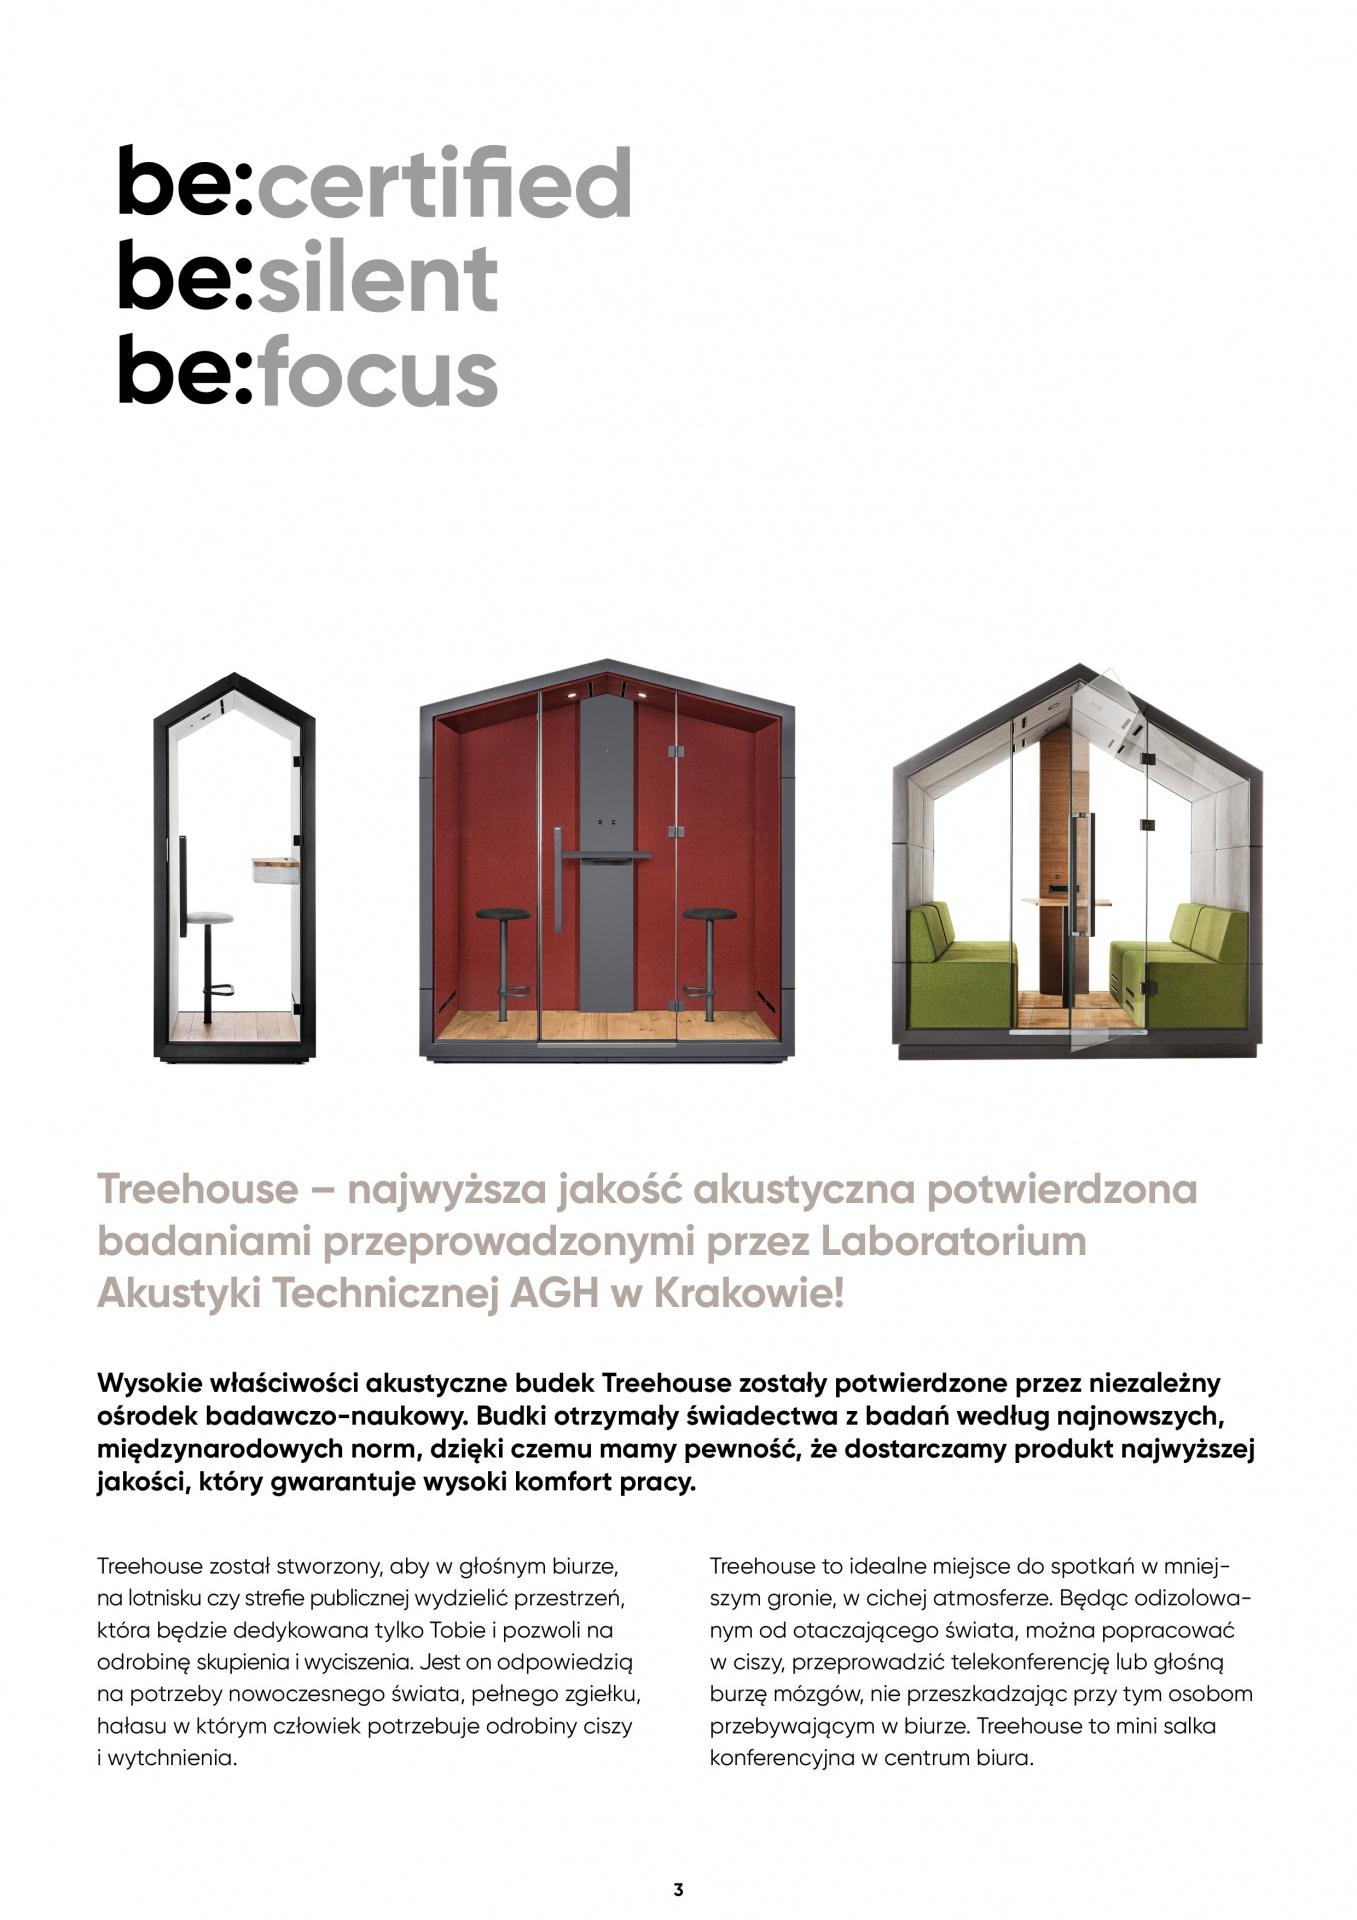 broszura-akustyczna-th-pl-3.jpg